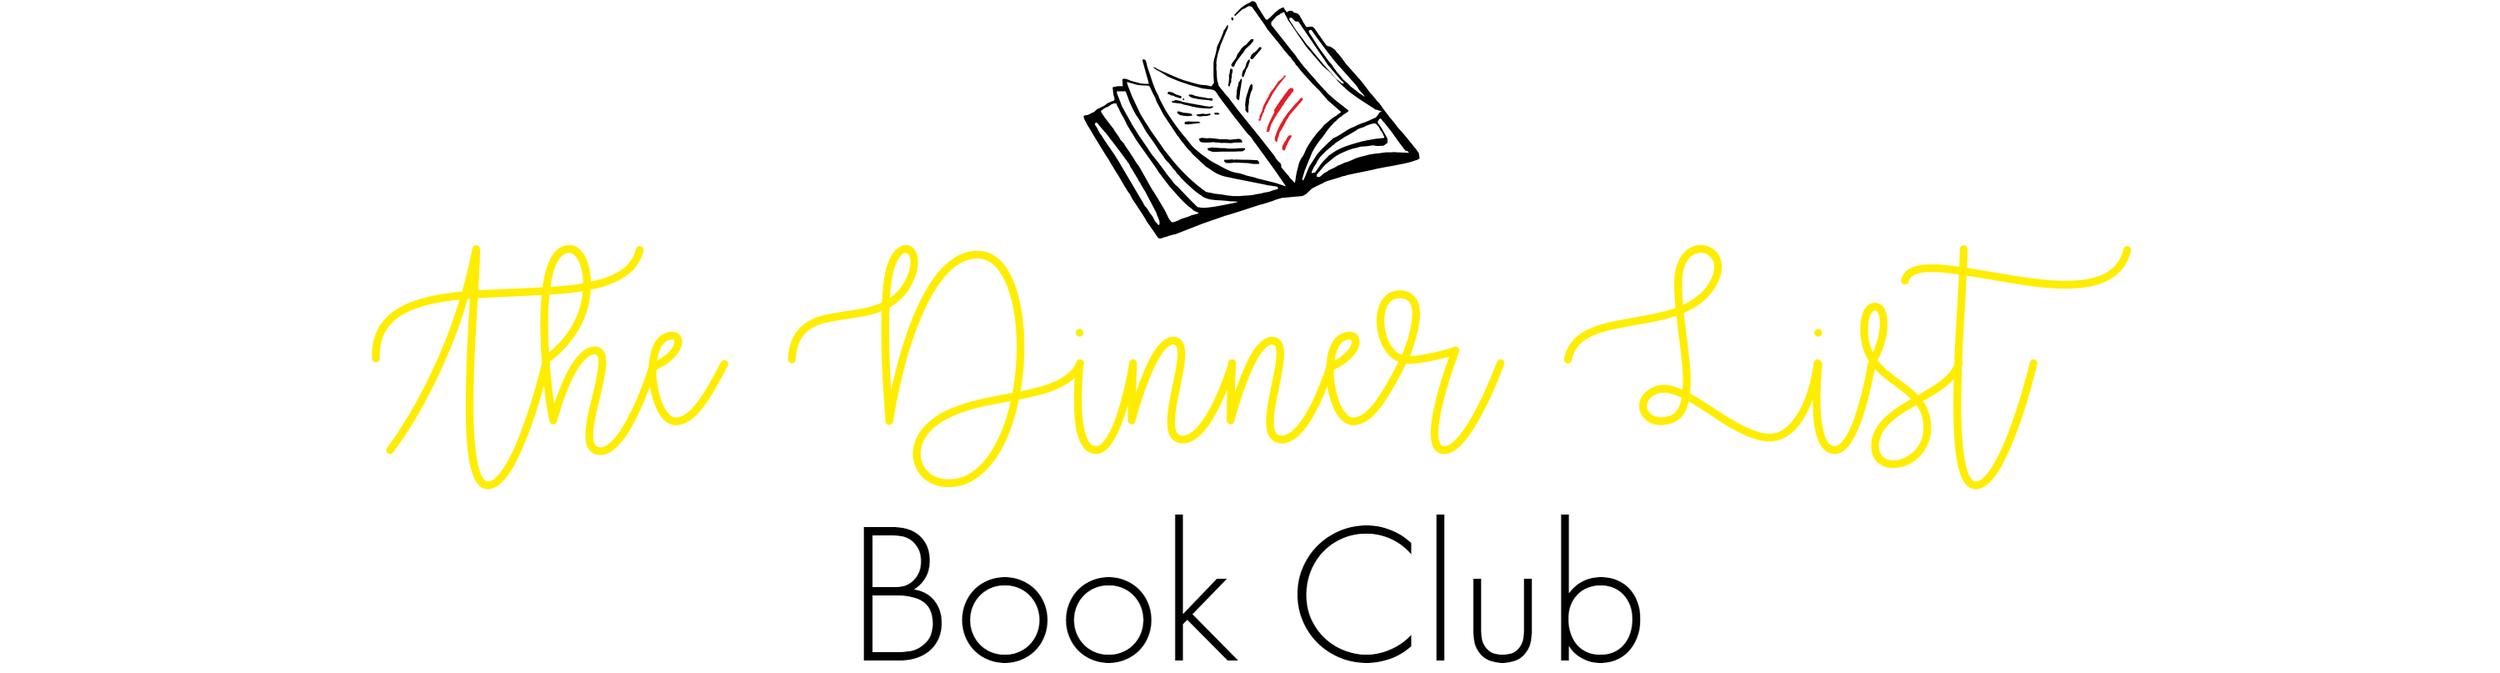 Book Club Header8.png